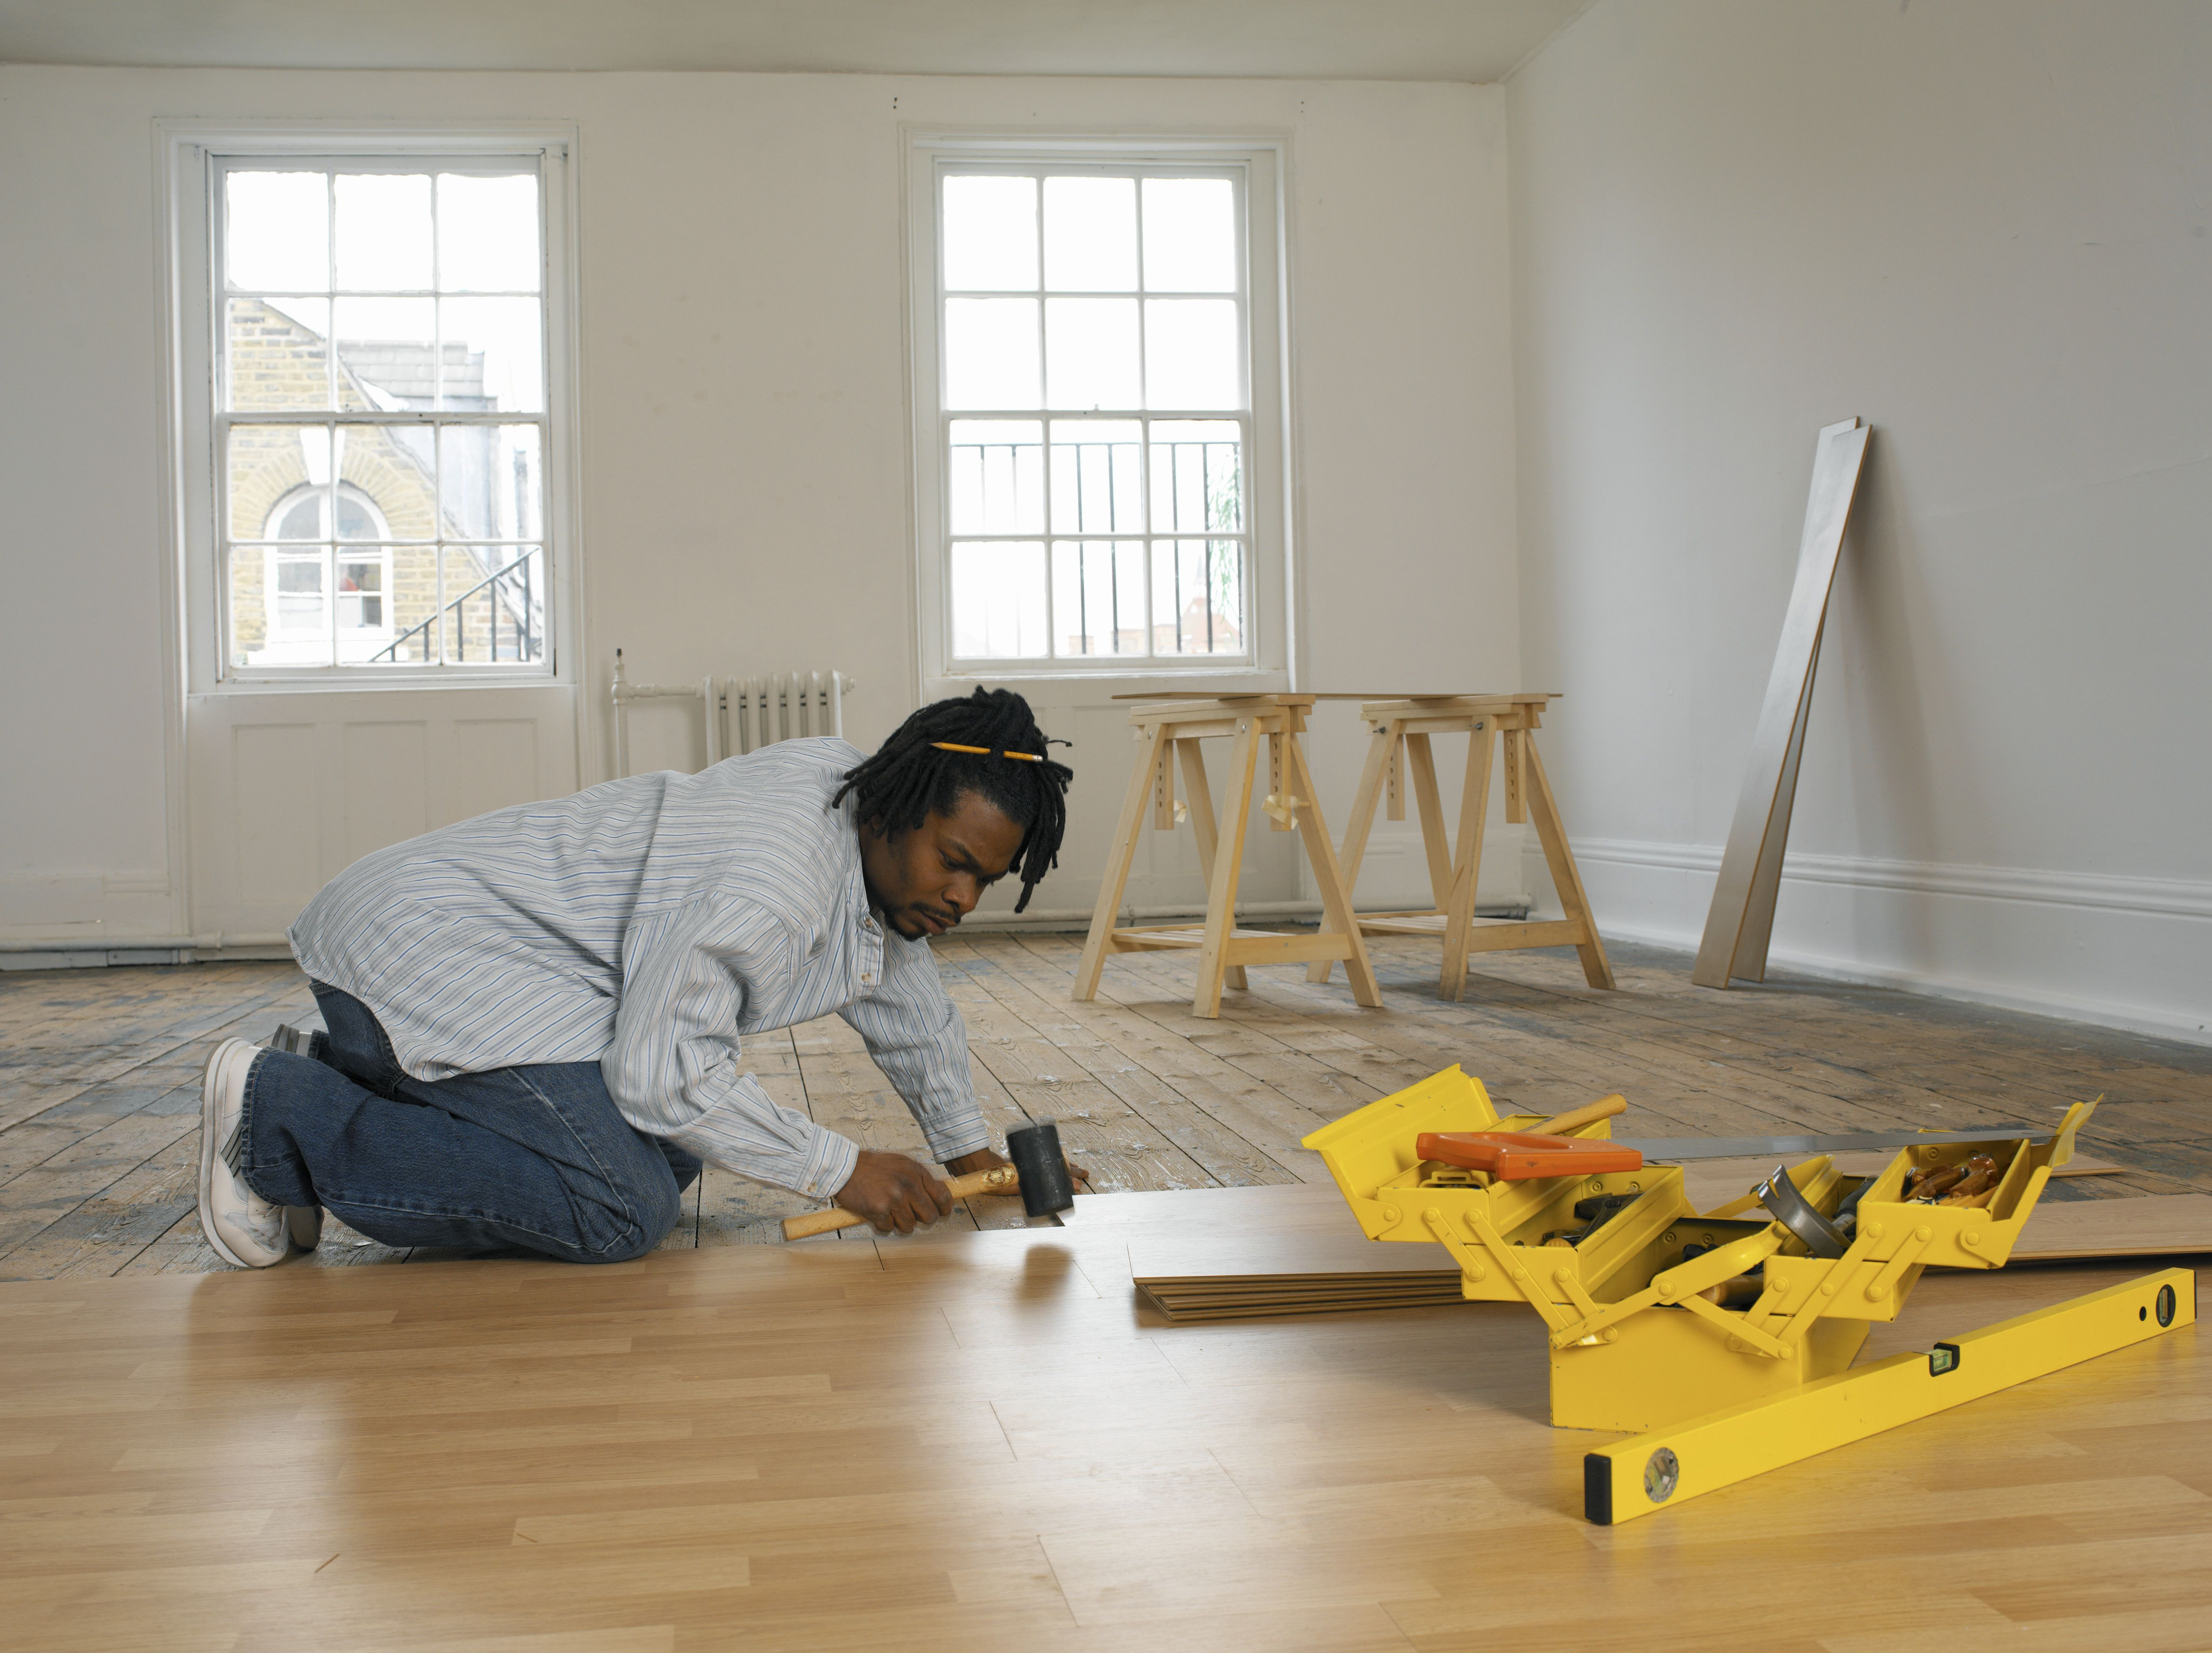 hardwood look laminate flooring of major manufacturing brands for laminate flooring in laying laminate flooring